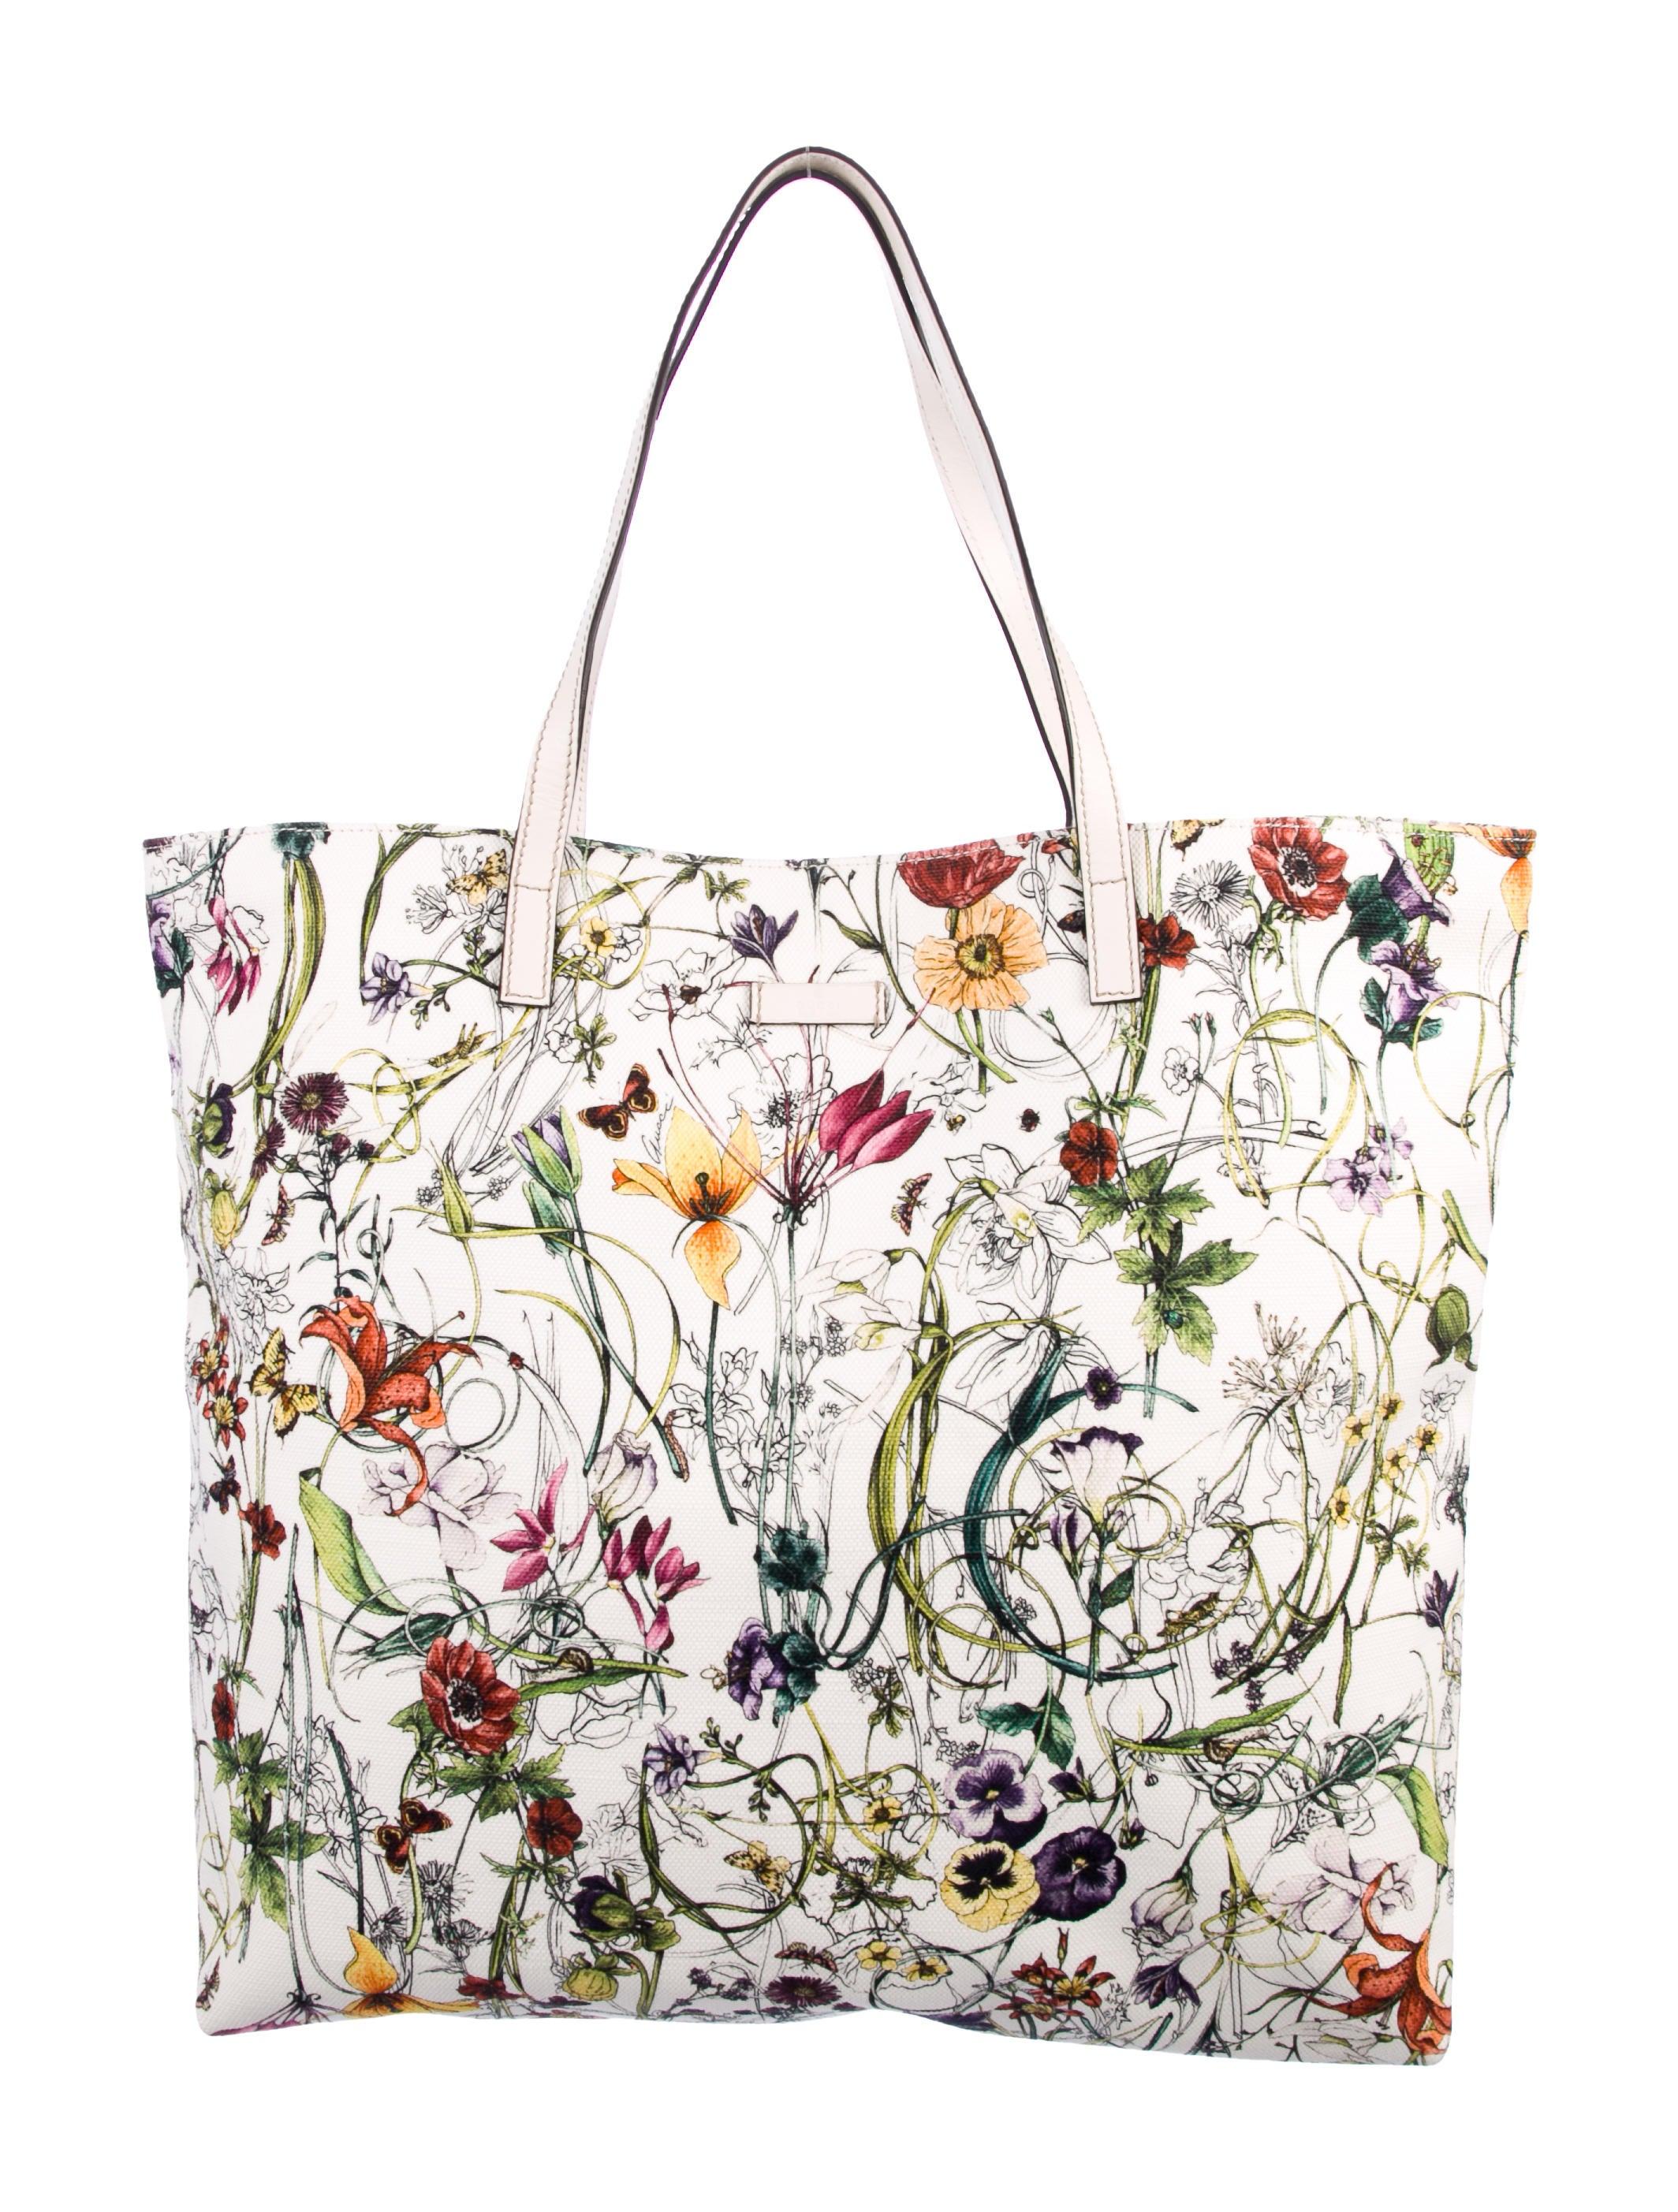 6c8732307592 Gucci Large Flora Tote - Handbags - GUC252167 | The RealReal